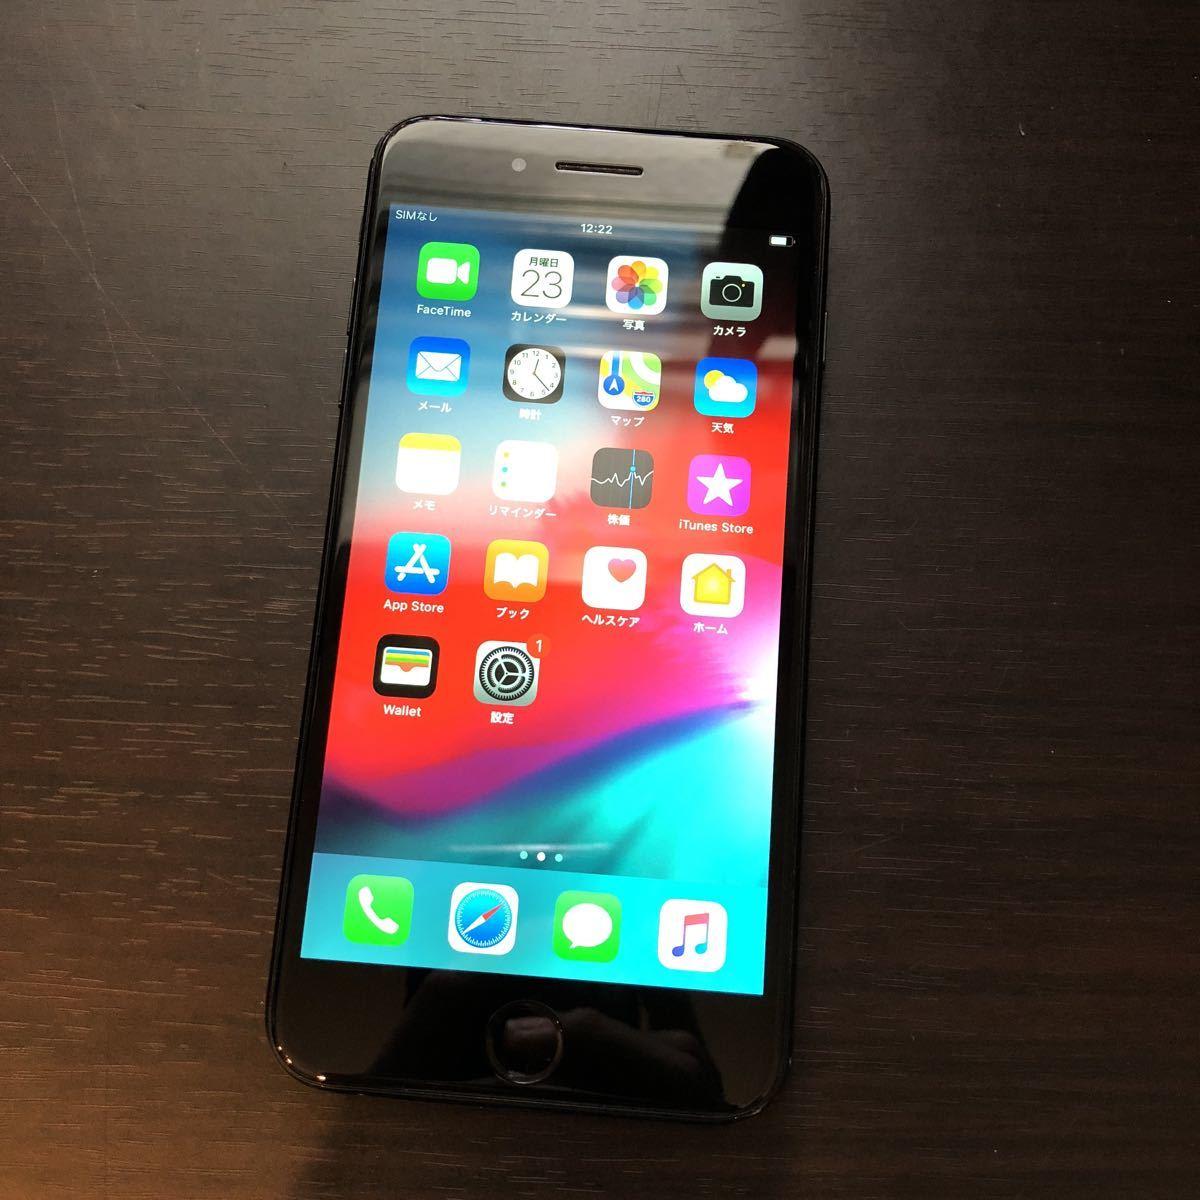 iPhone7Plus 256GB SIMフリー ブラック 中古良品 [1505]